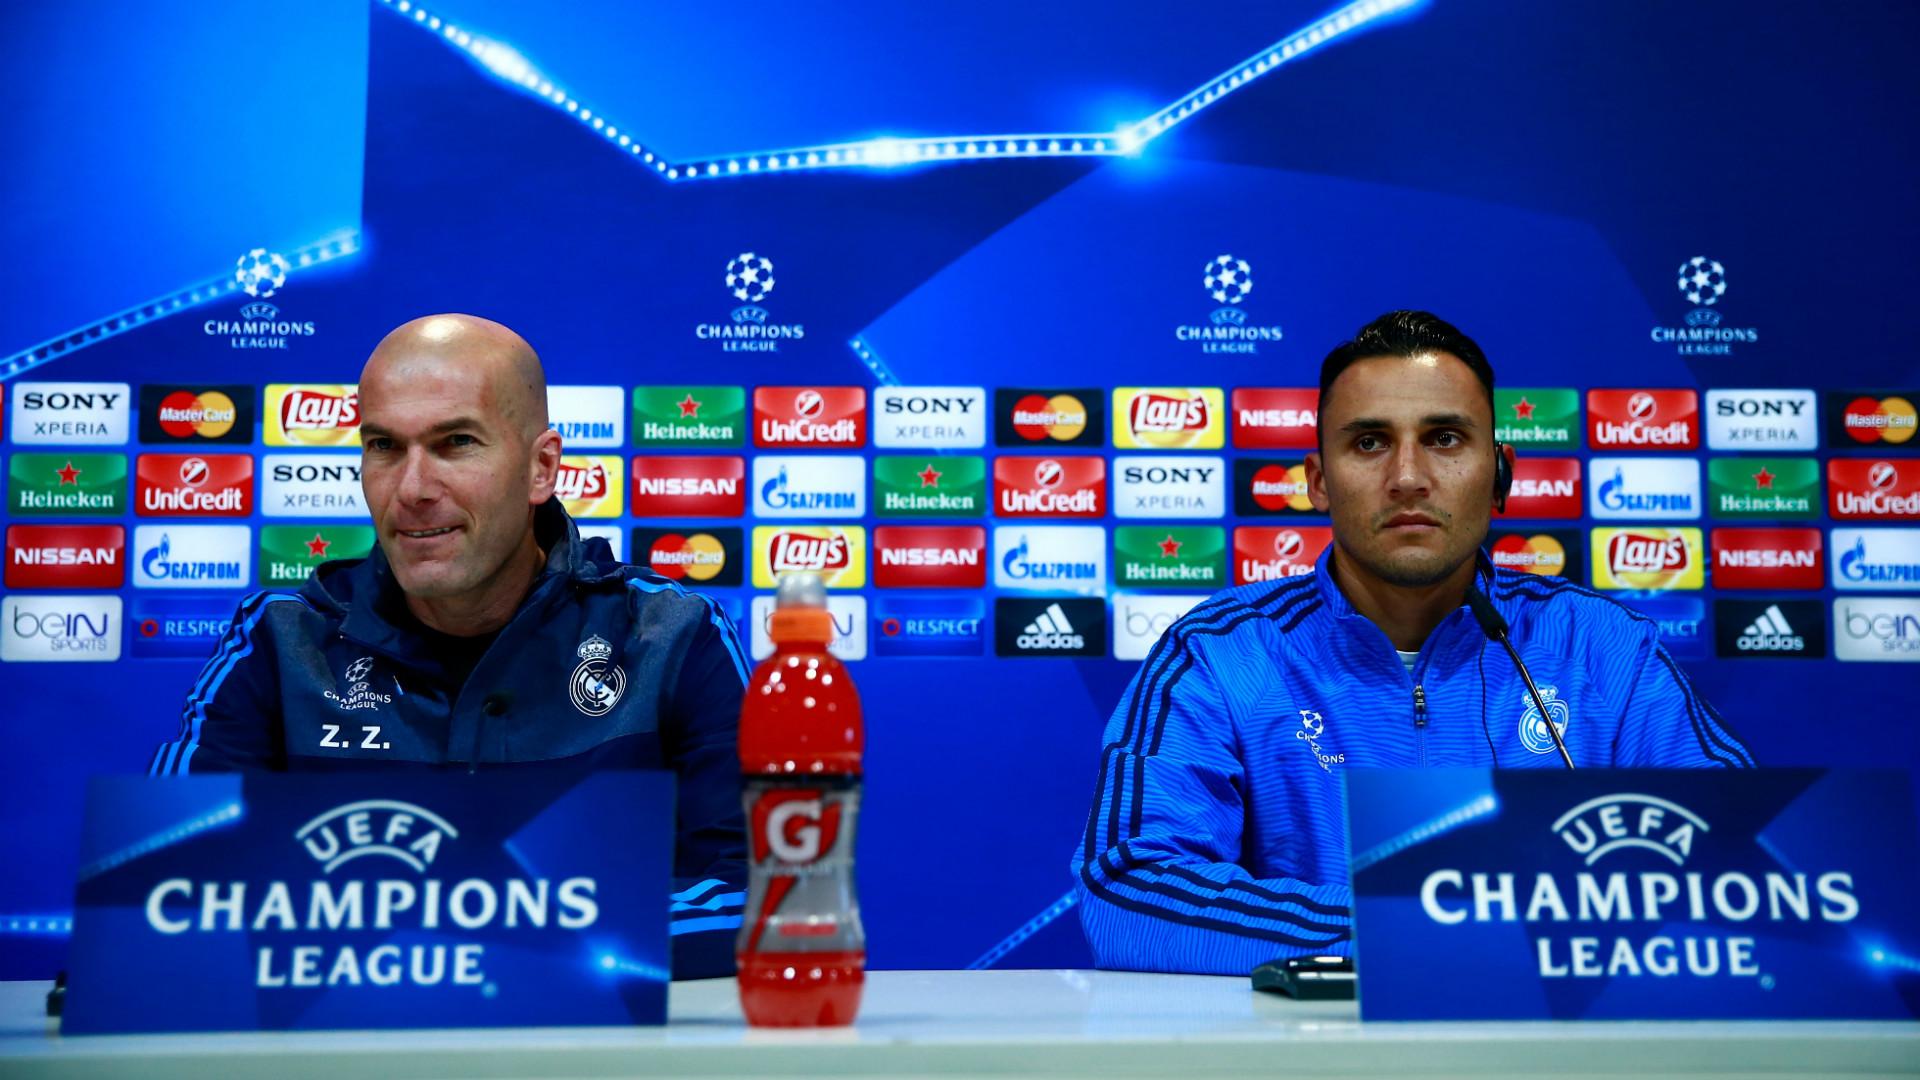 Zinedine Zidane Keylor Navas Real Madrid press conference